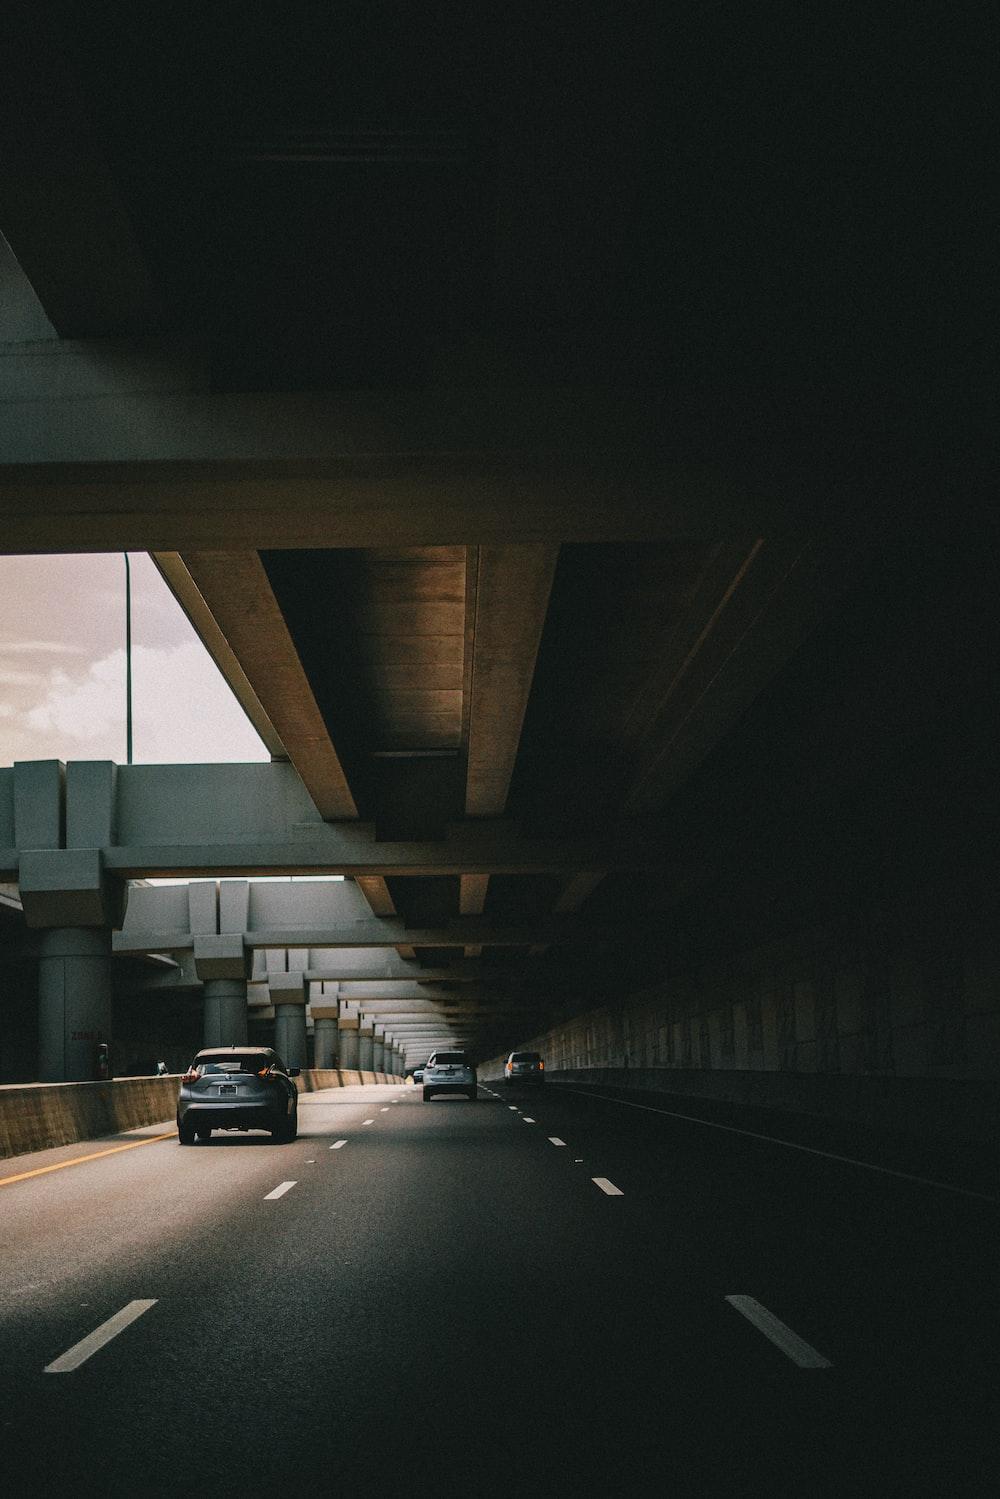 running vehicles on road under bridge